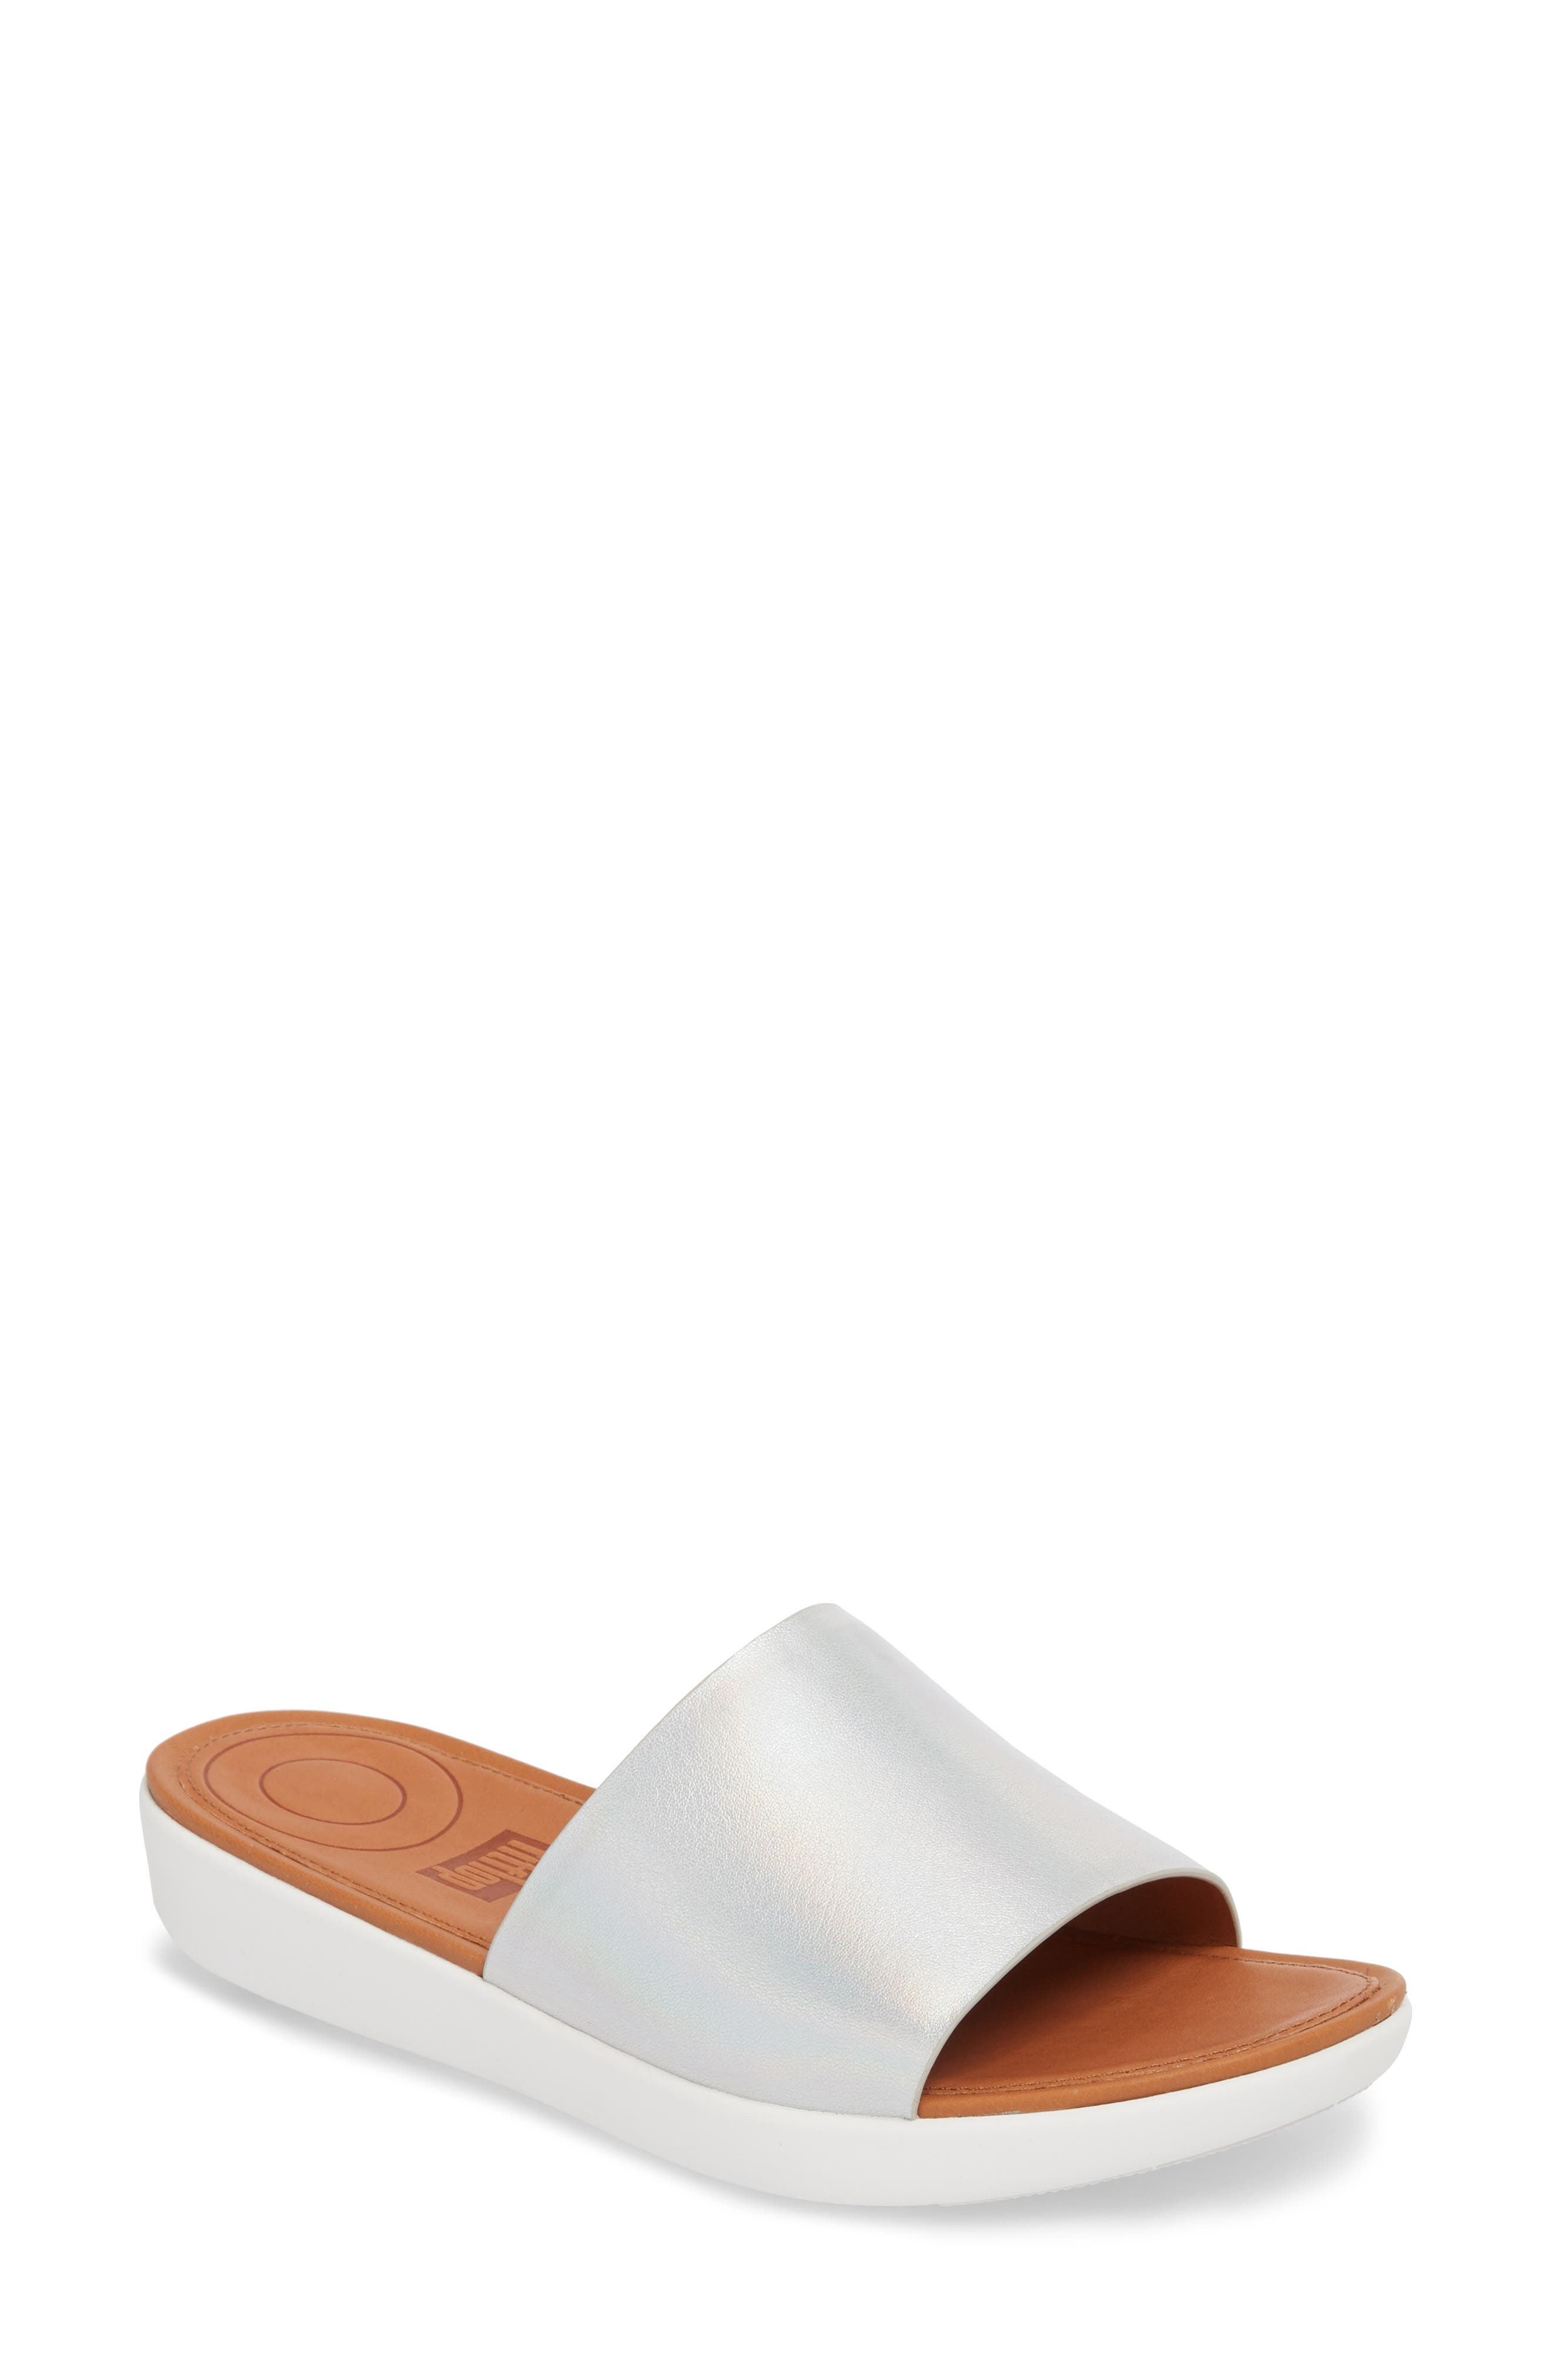 Sola Sandal,                         Main,                         color, Silver Iridescent